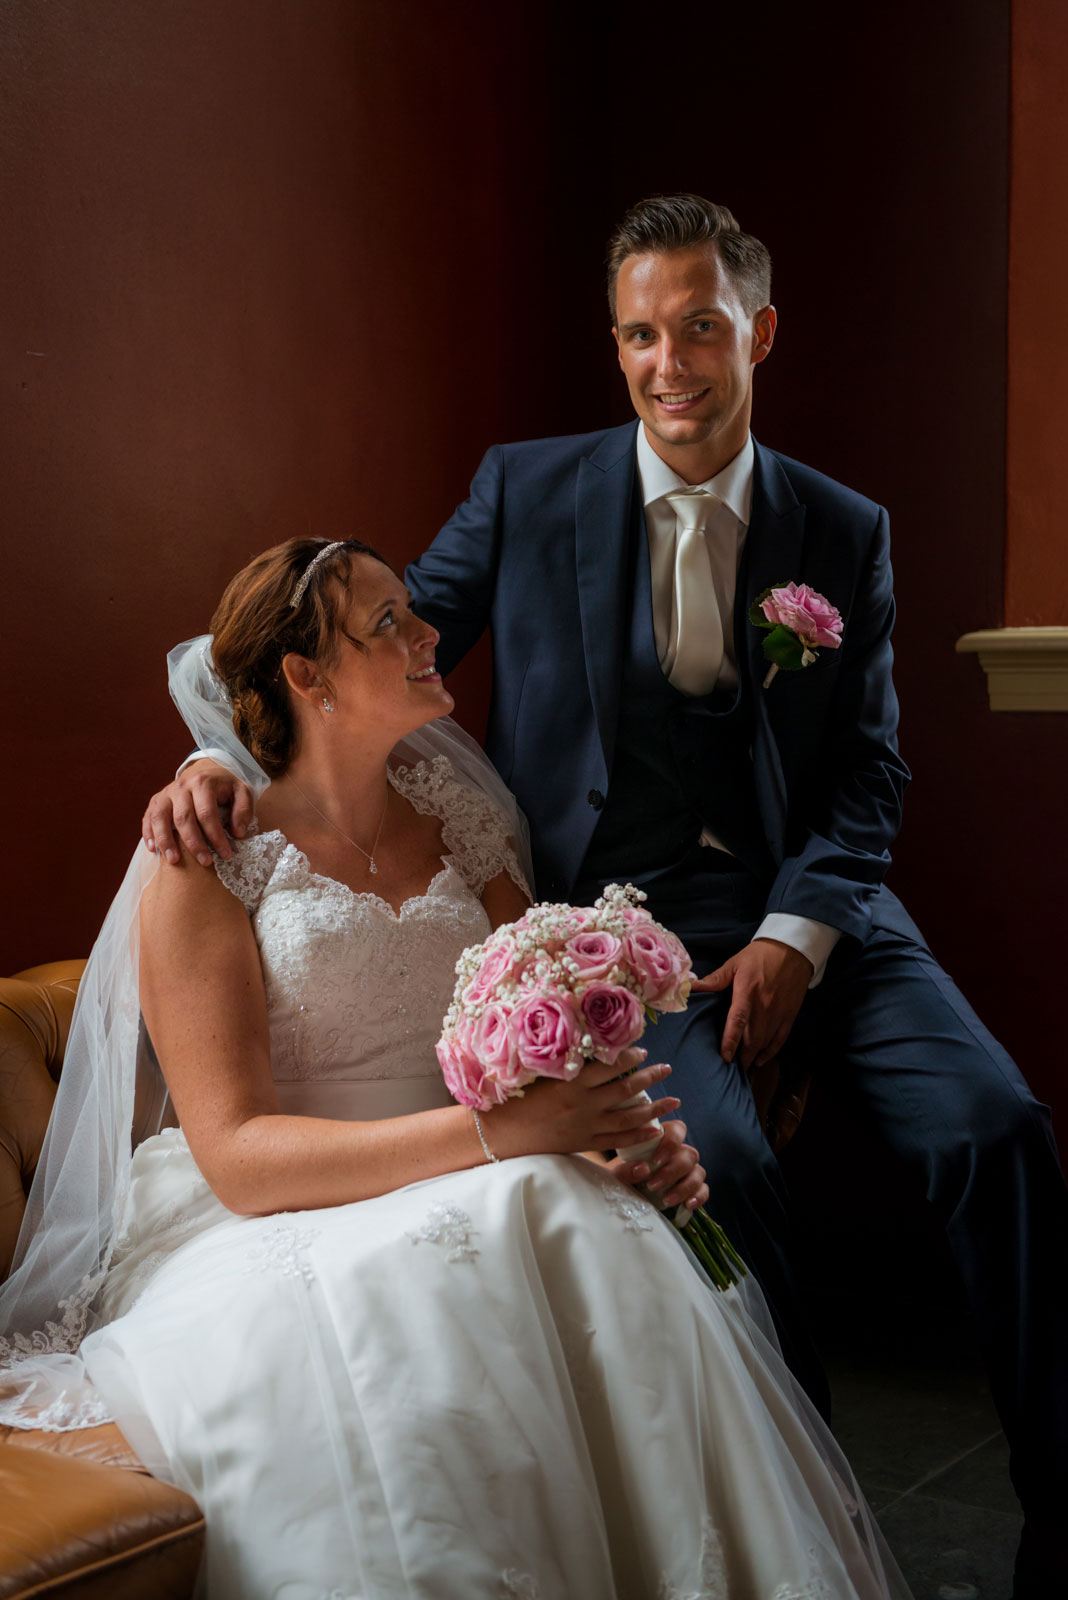 Rienk Boode Bruidsfotografie Westland Den Haag Delft Rotterdam